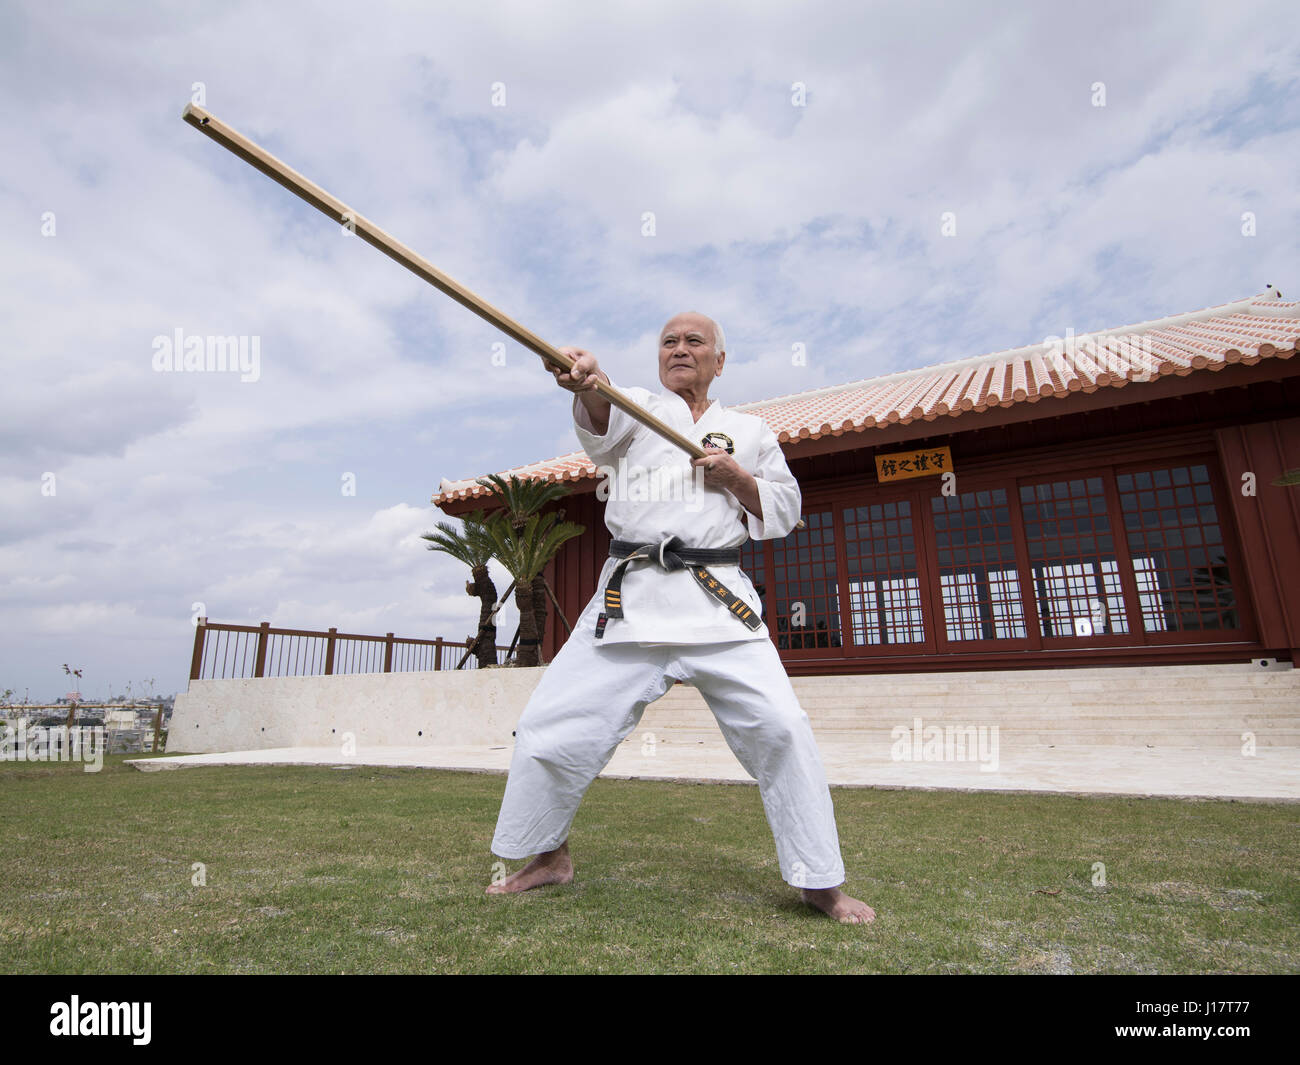 Karate master Arakaki sensei al 100 Kobudo Kata evento al Karate Kaikan, Okinawa, in Giappone Immagini Stock